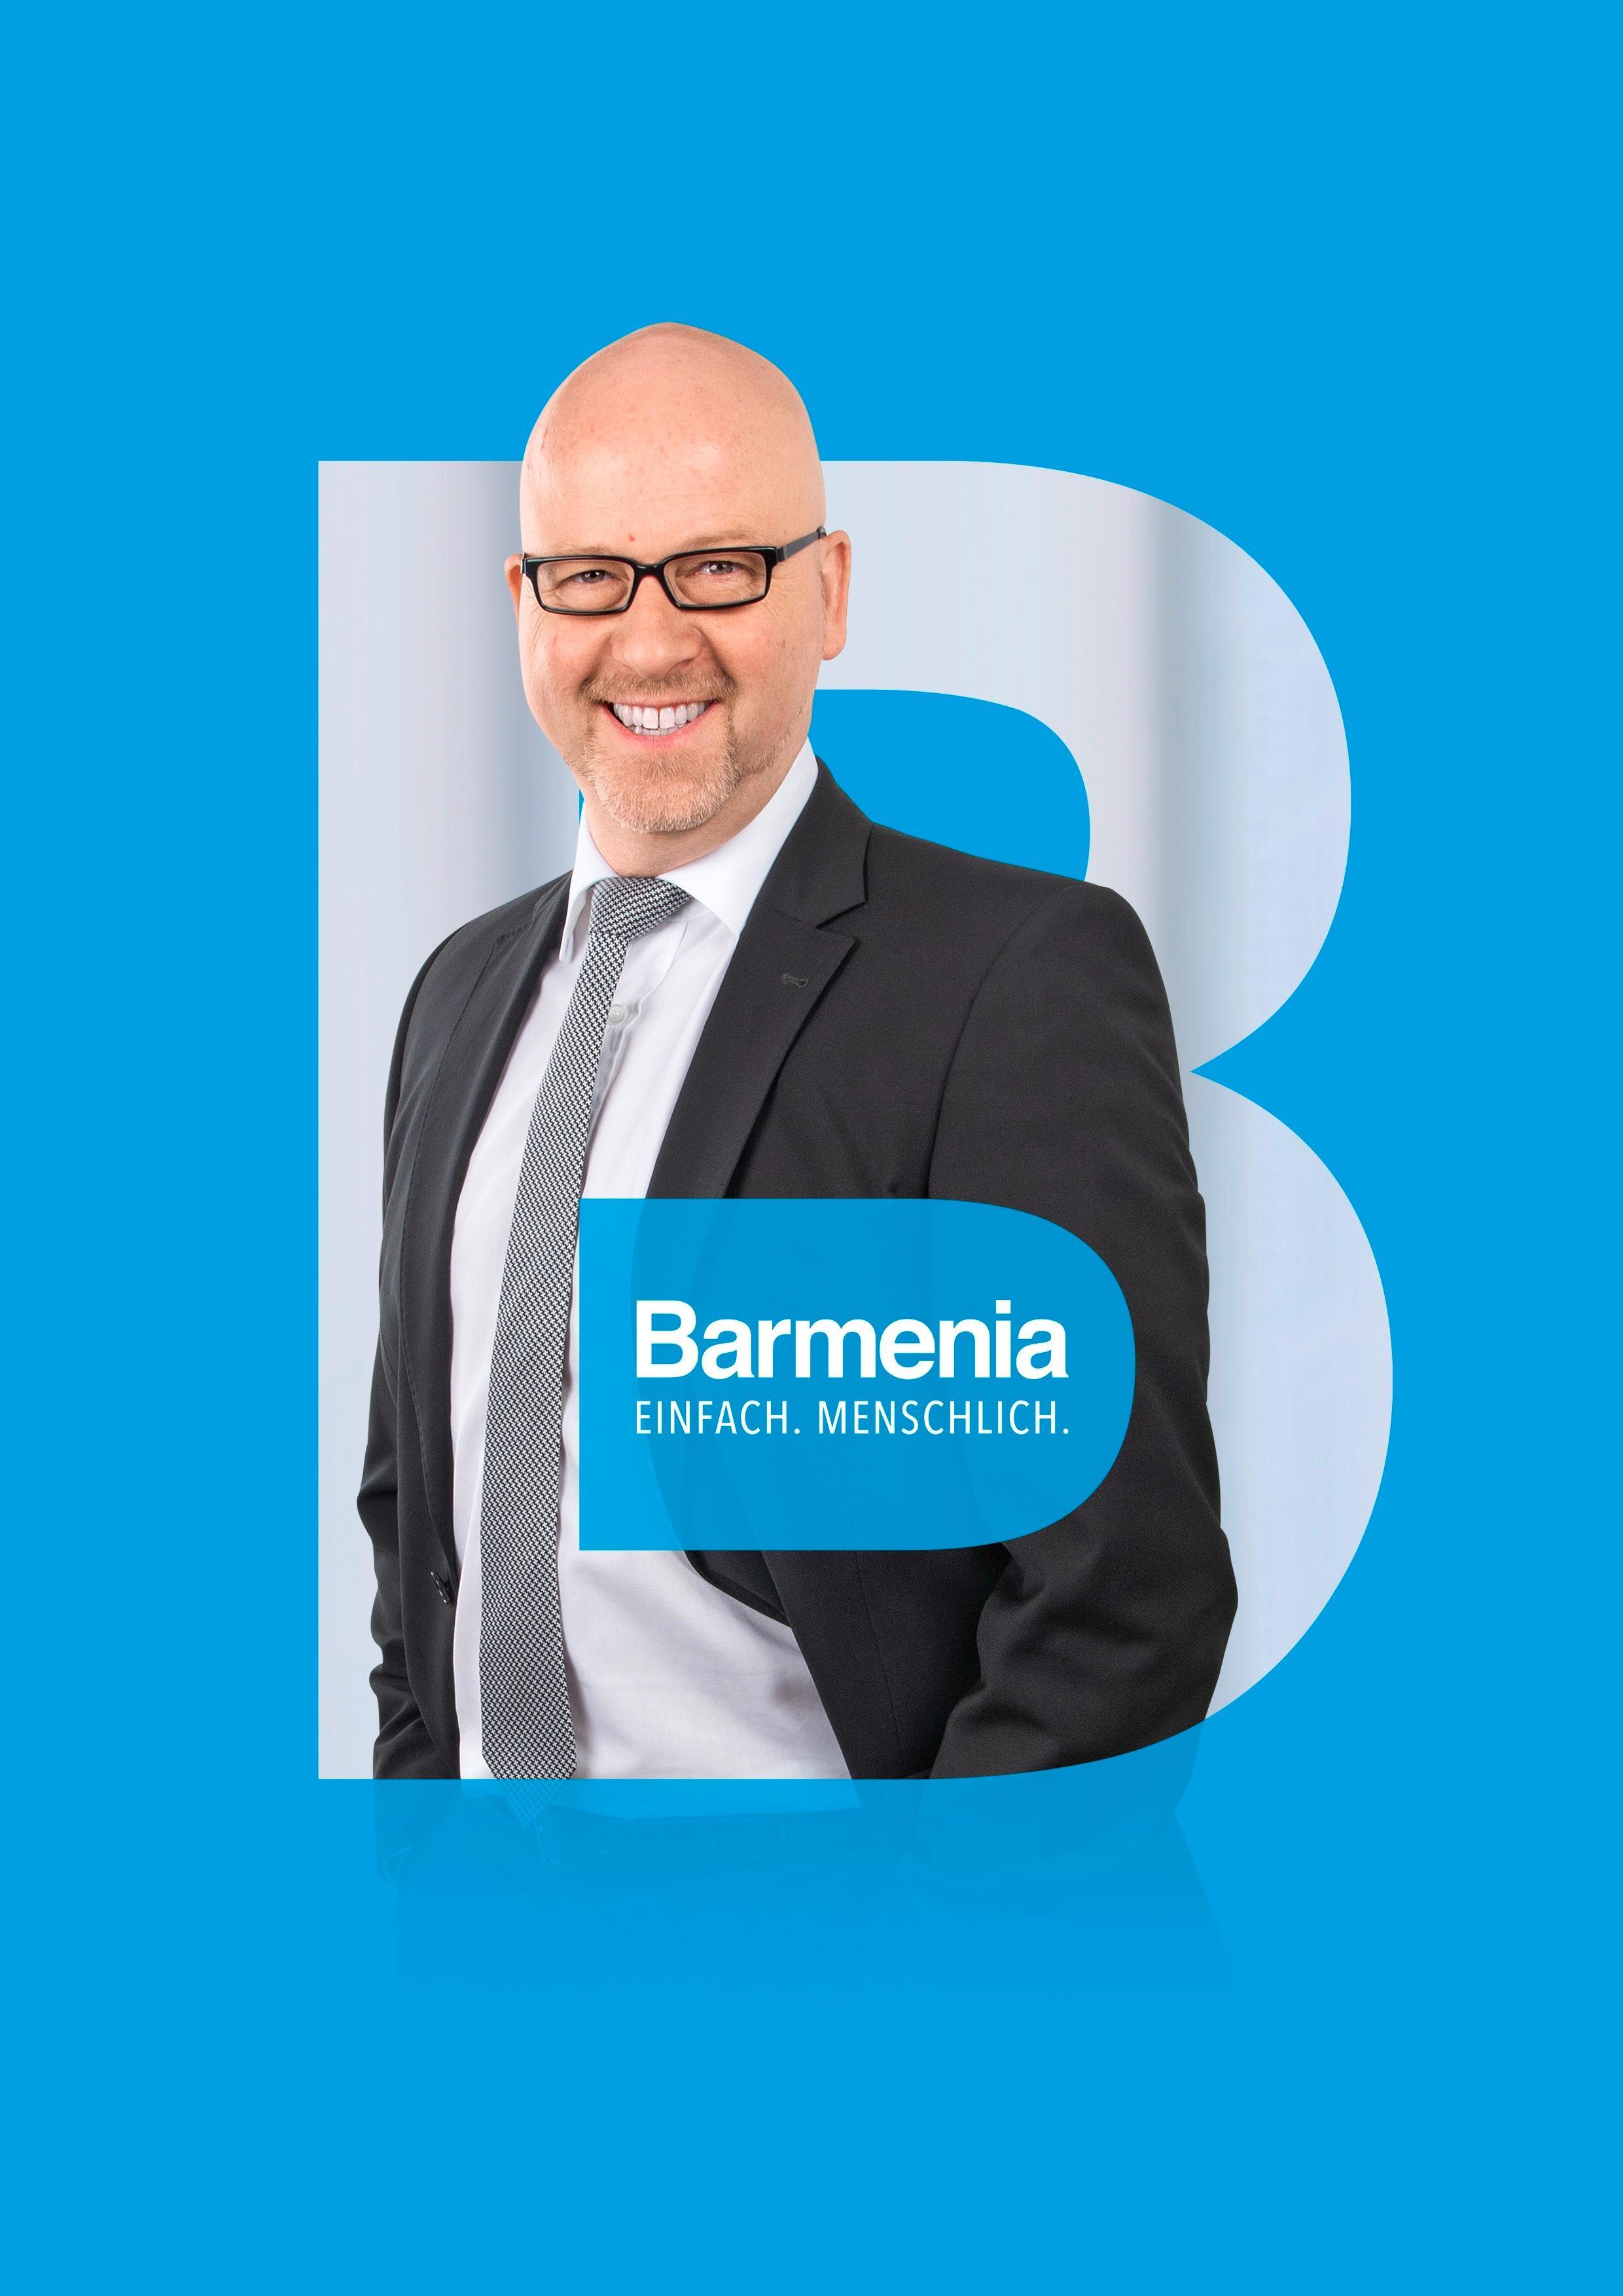 Barmenia Versicherung - Elmar Jansen e. K., Hermann-Sudermann-Str. 25 in Aachen